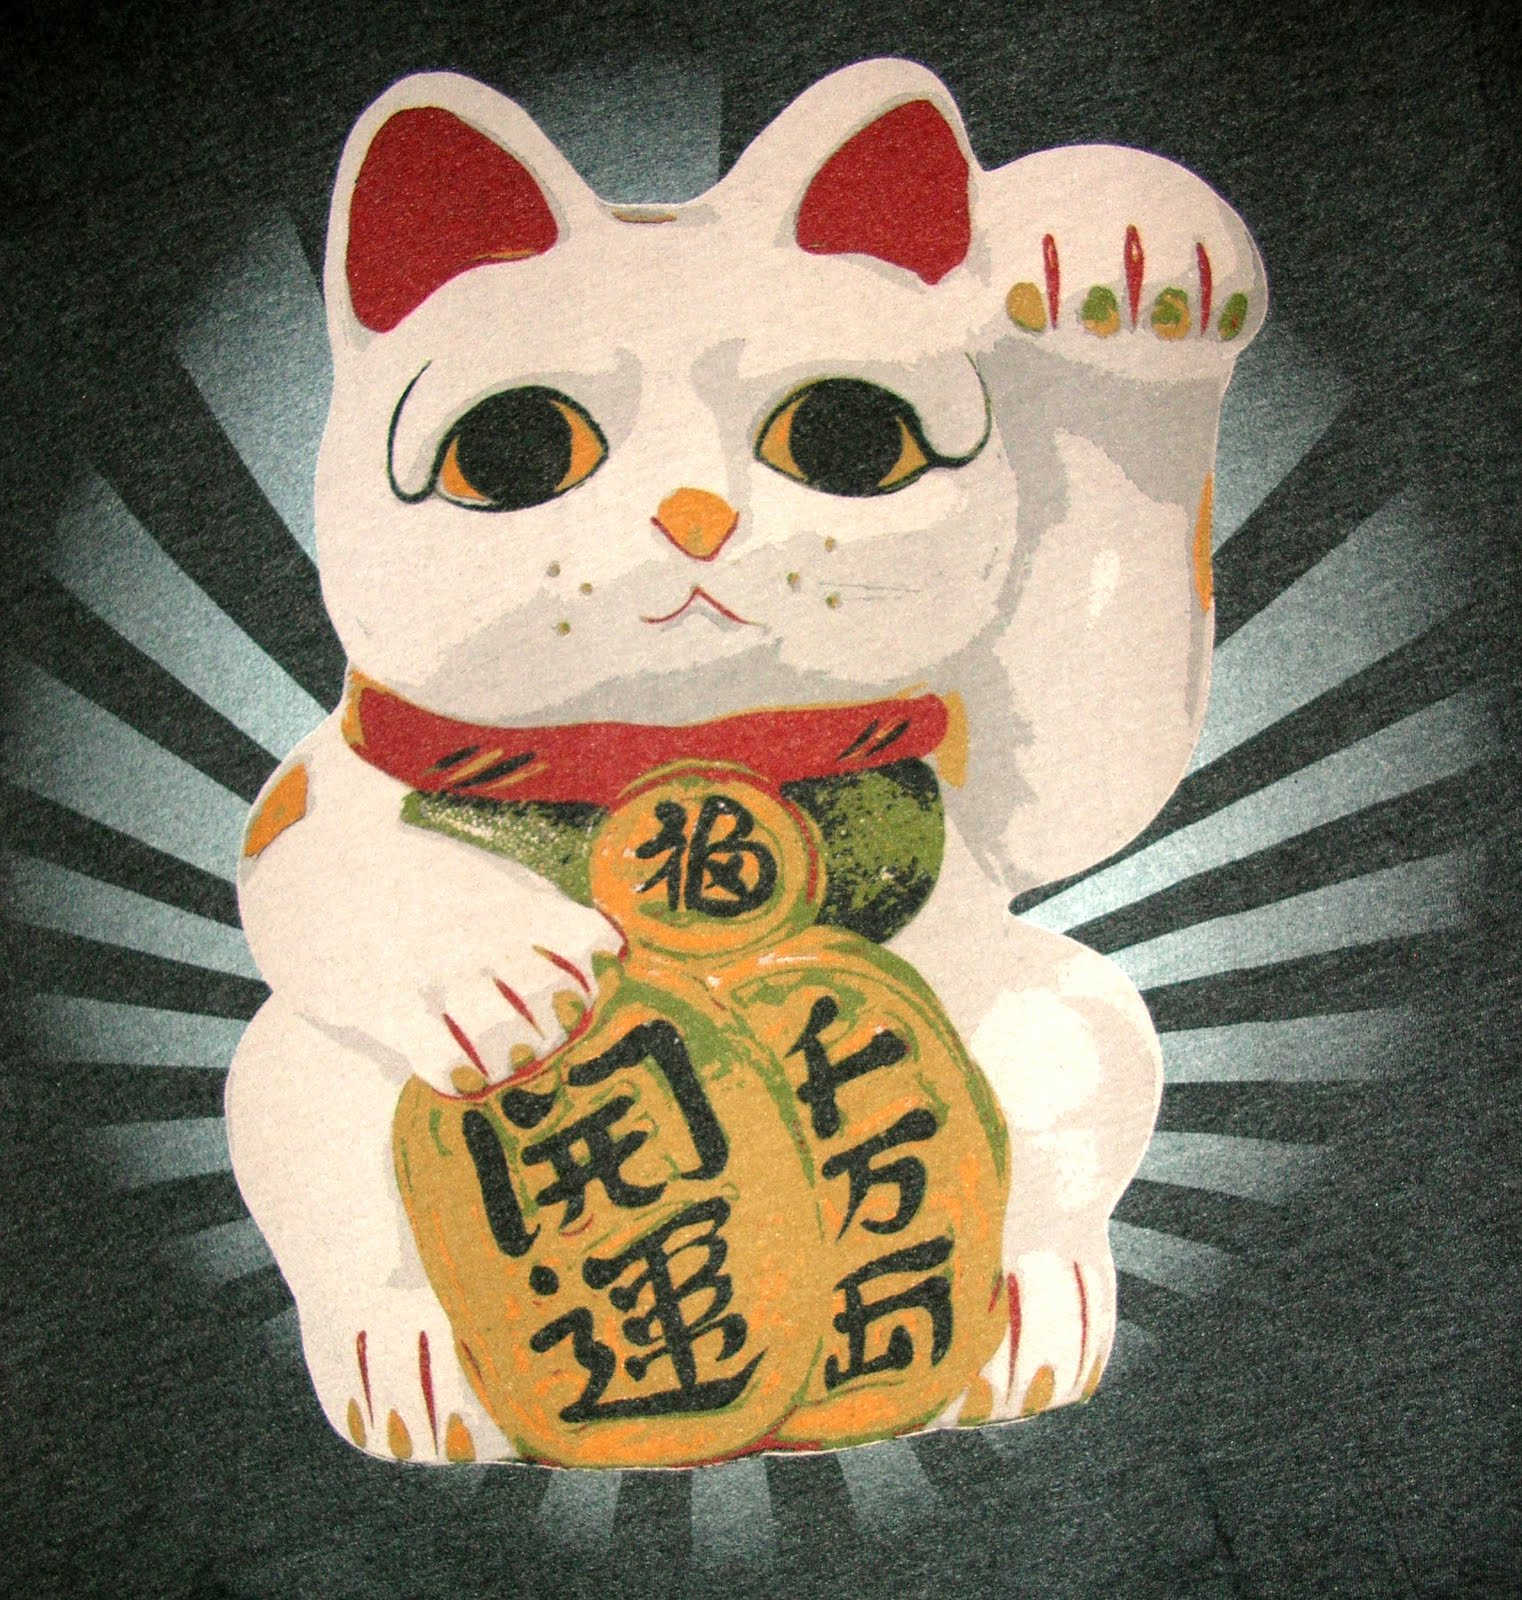 Baldufa gato de la fortuna - Que dias dan mala suerte en la cultura china ...